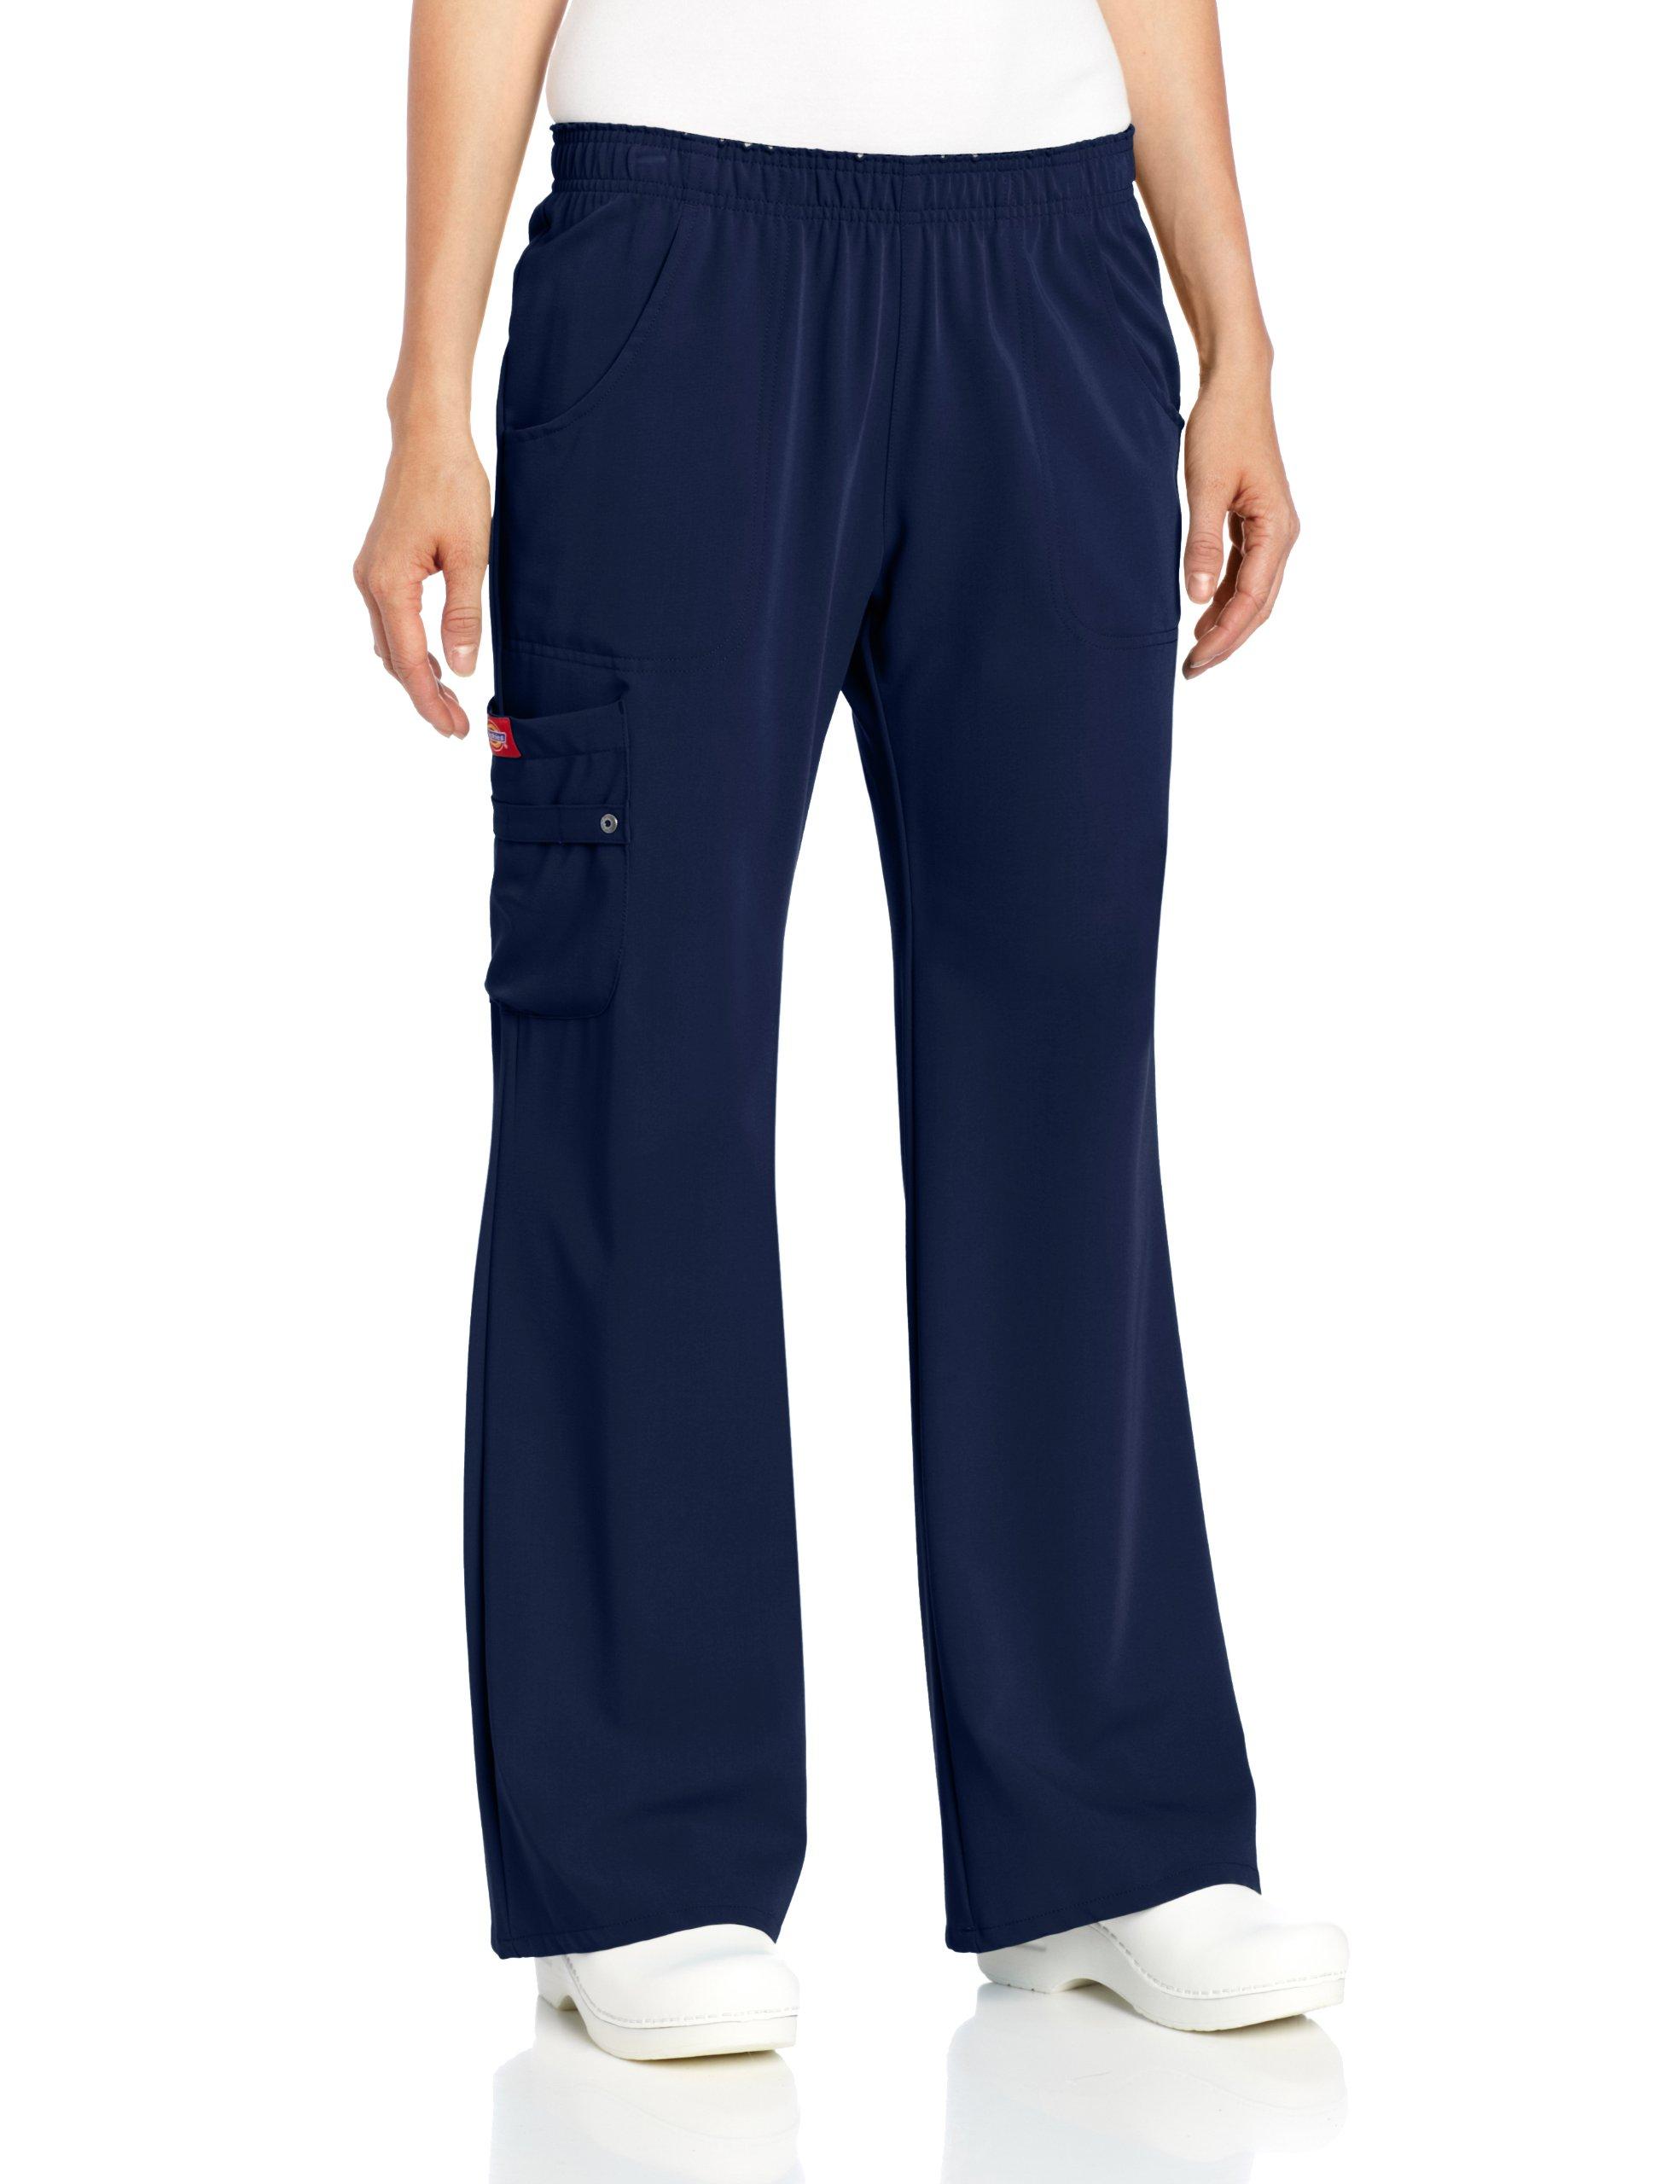 Dickies Scrubs Women's Xtreme Stretch Fit Elastic Waist, Navy, Medium